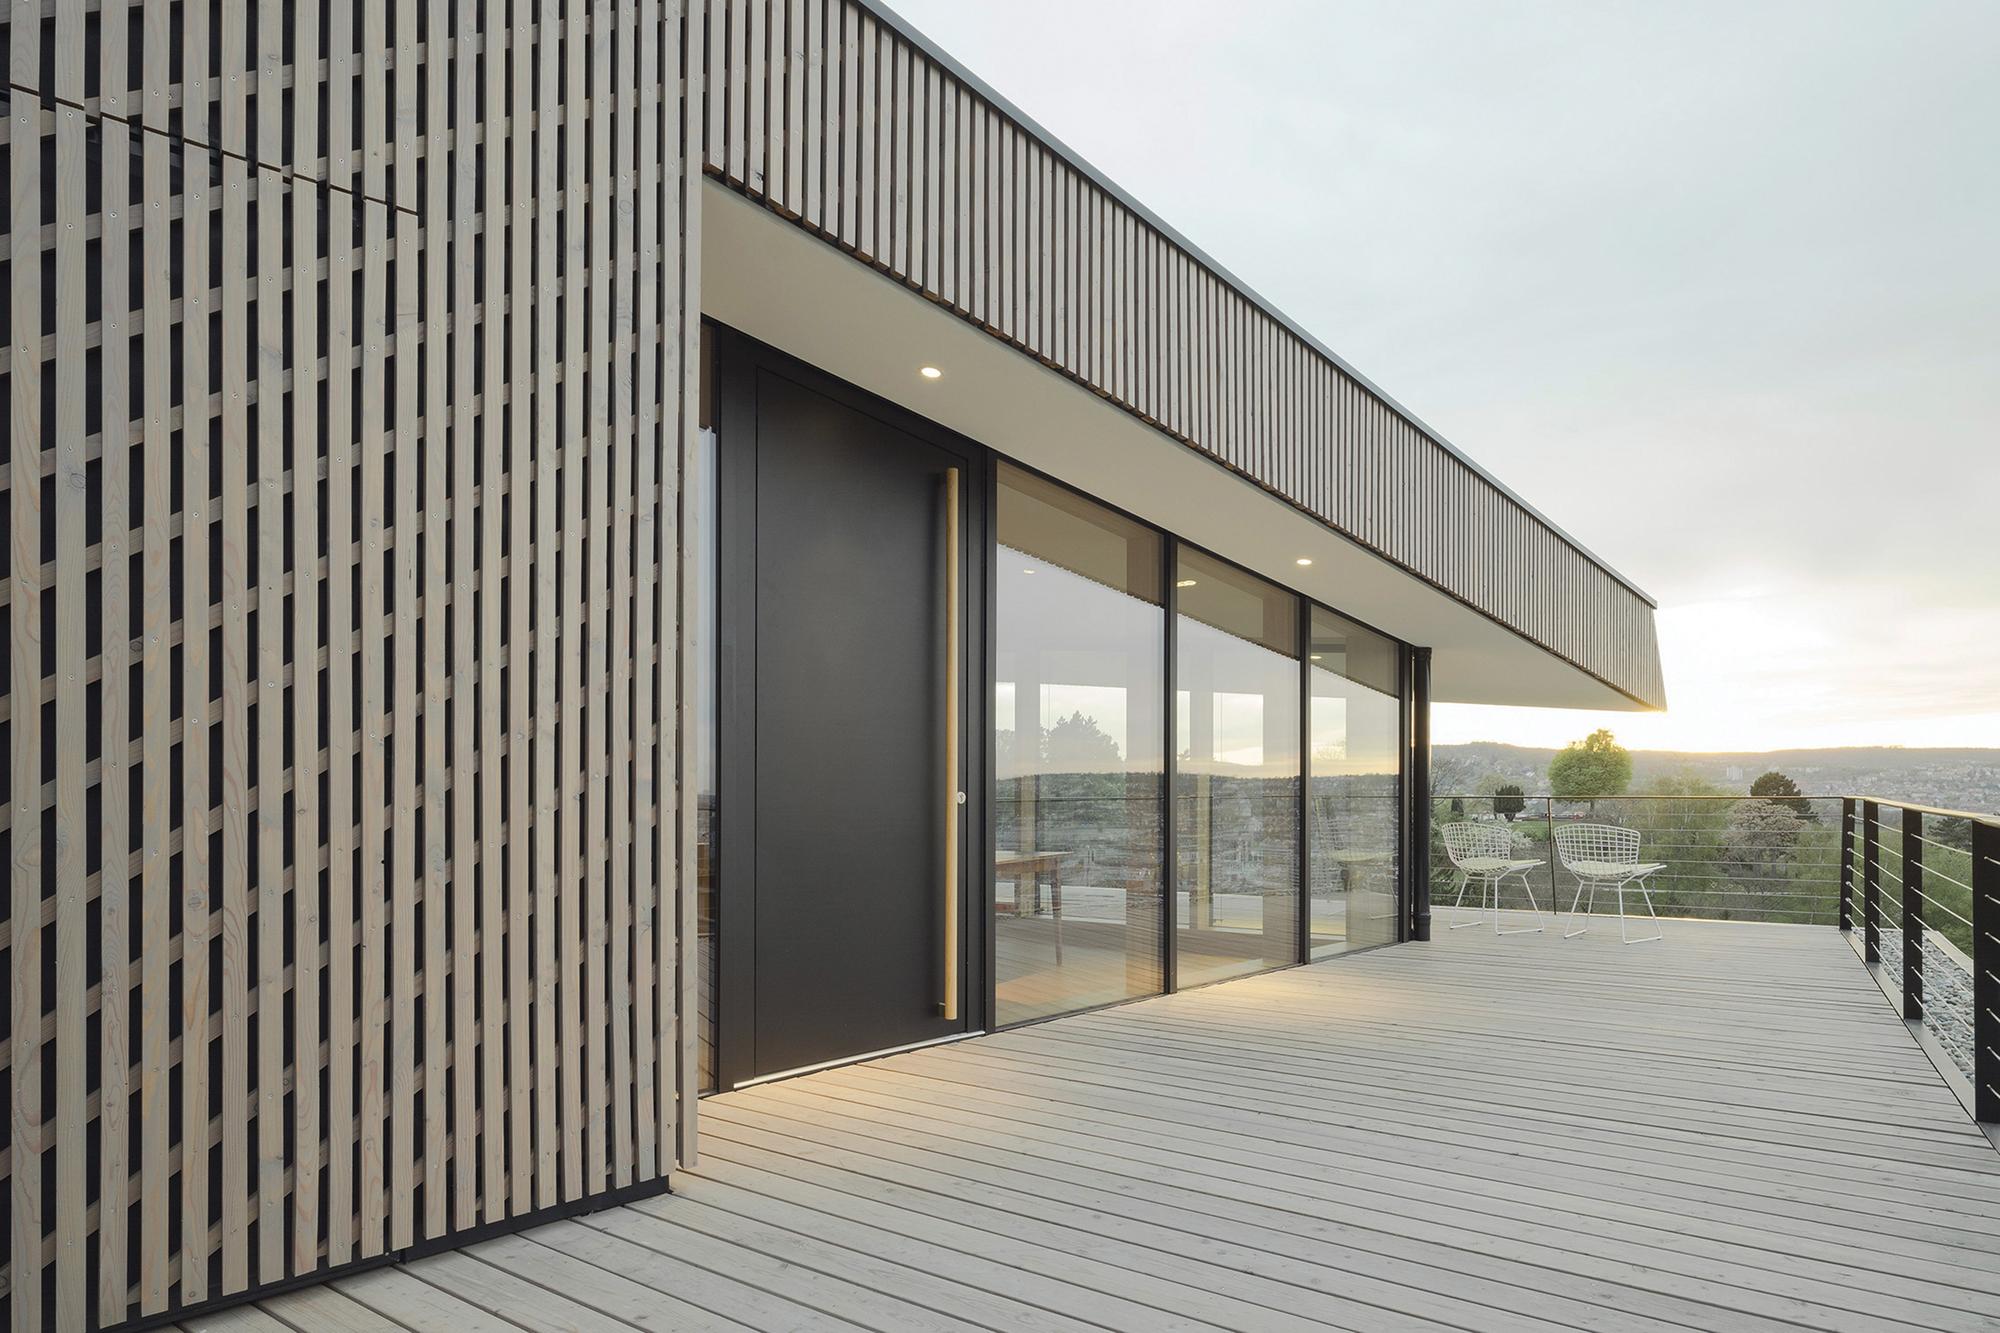 galer a de haus b yonder architektur und design 4. Black Bedroom Furniture Sets. Home Design Ideas